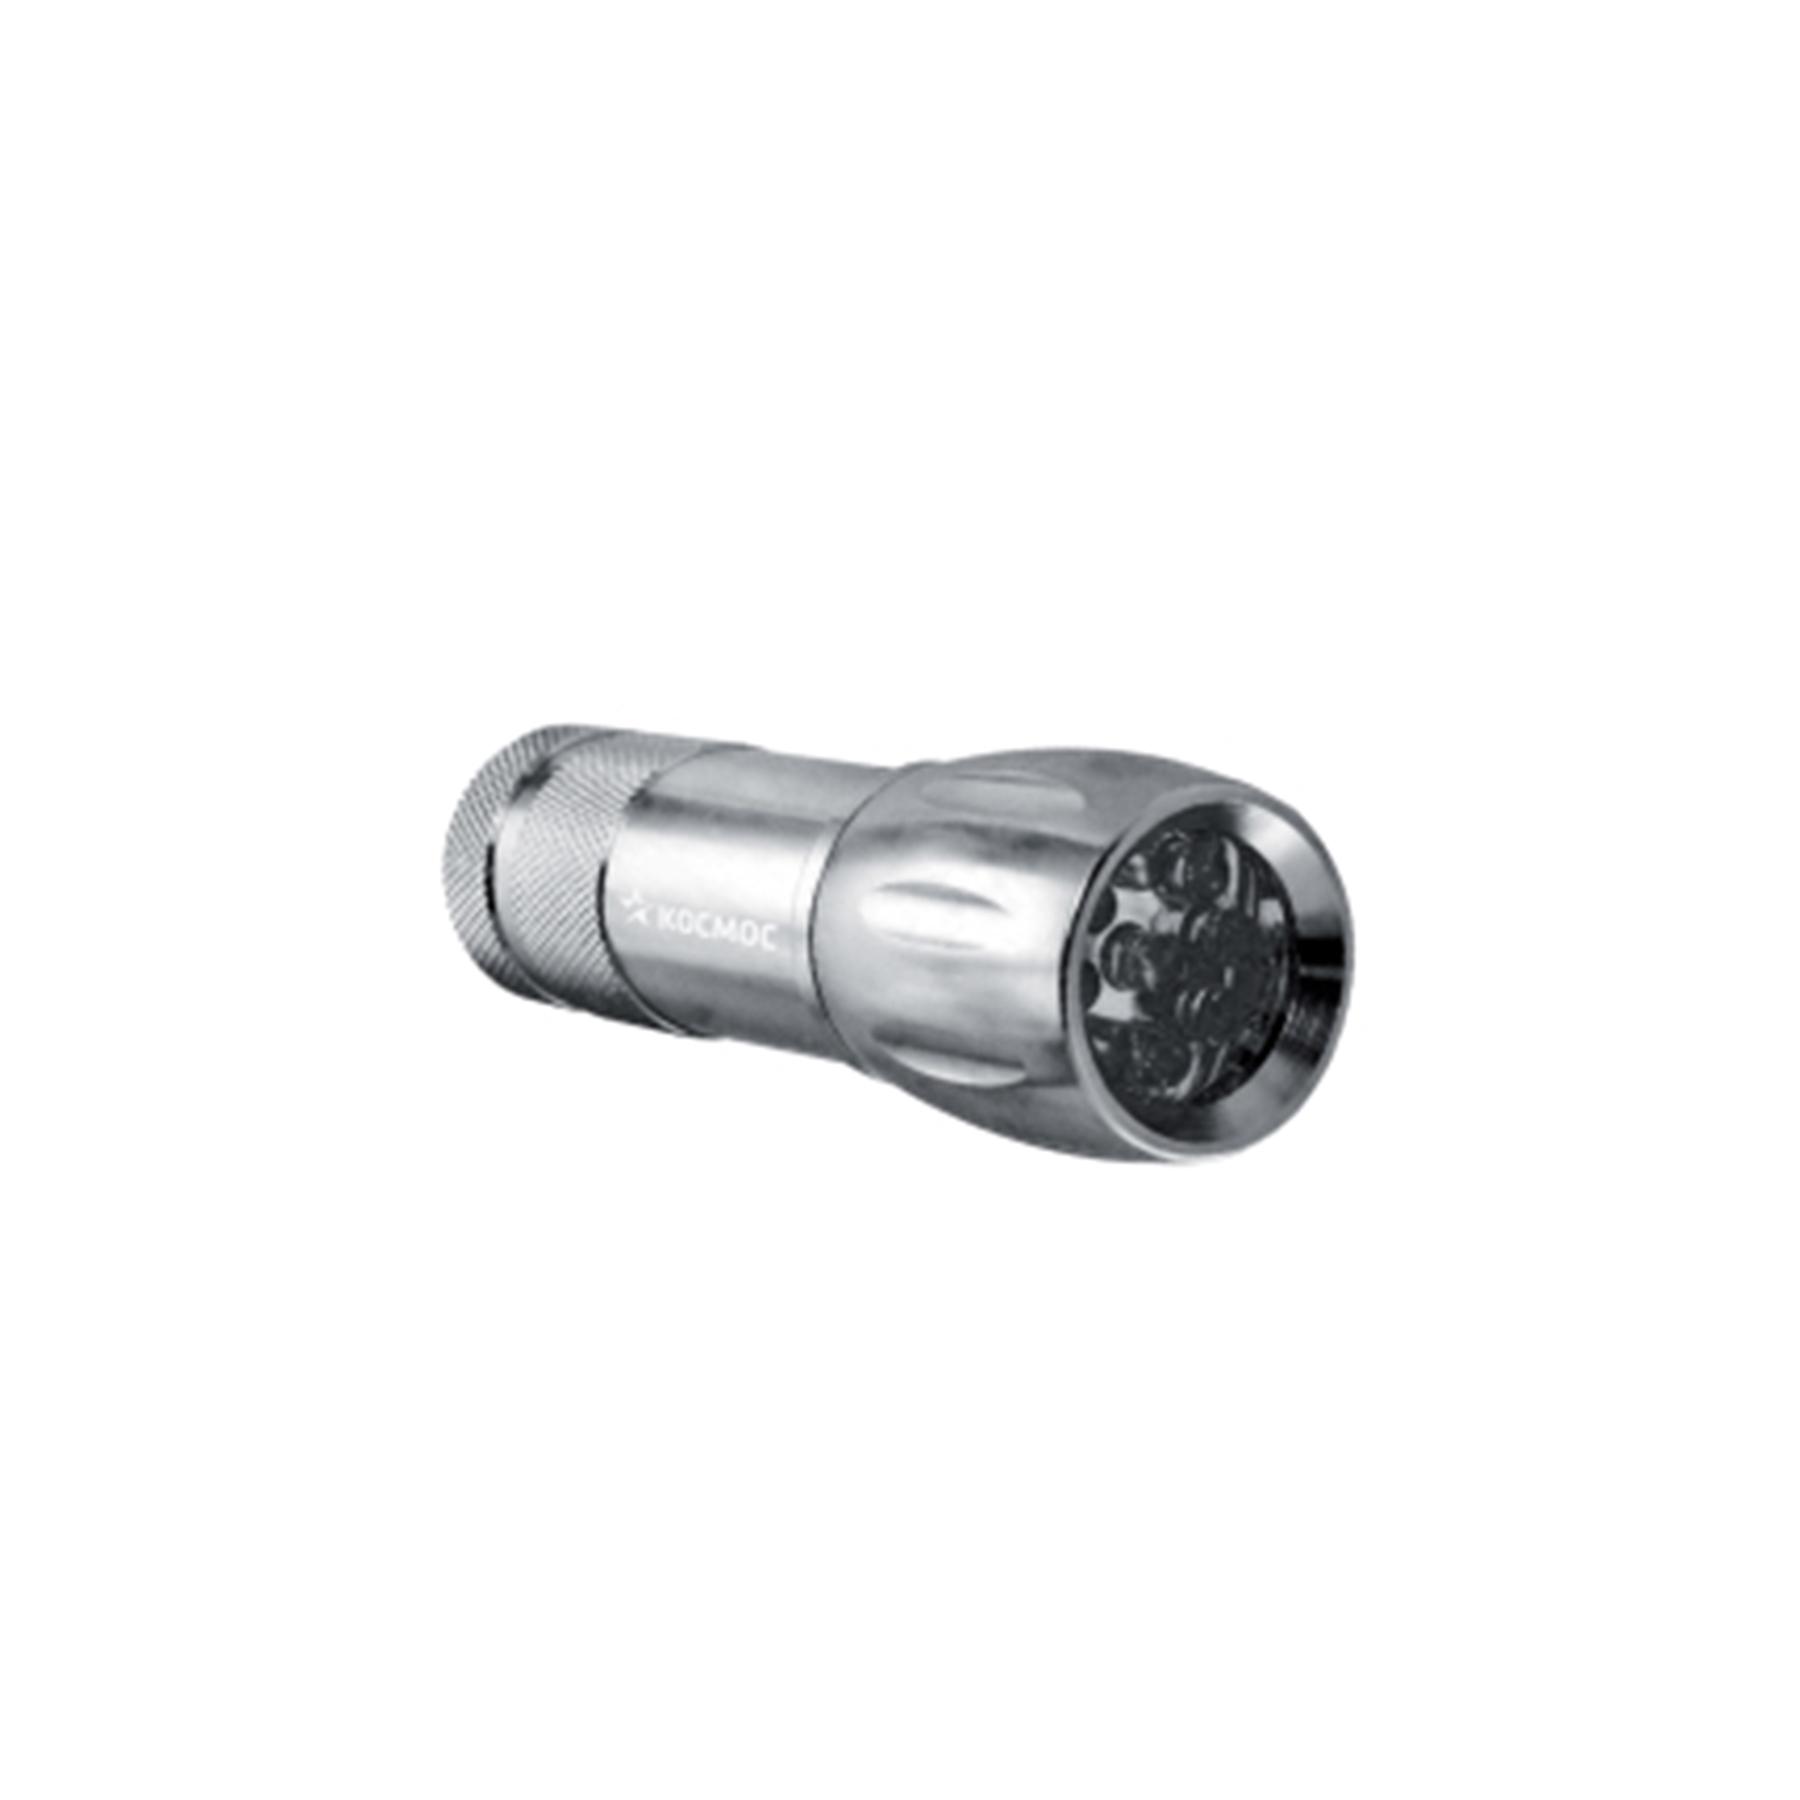 Фонарь Космос KOC-M2508-B-LED светодиод. 9хLED металл с элем.пит. 3*ААА